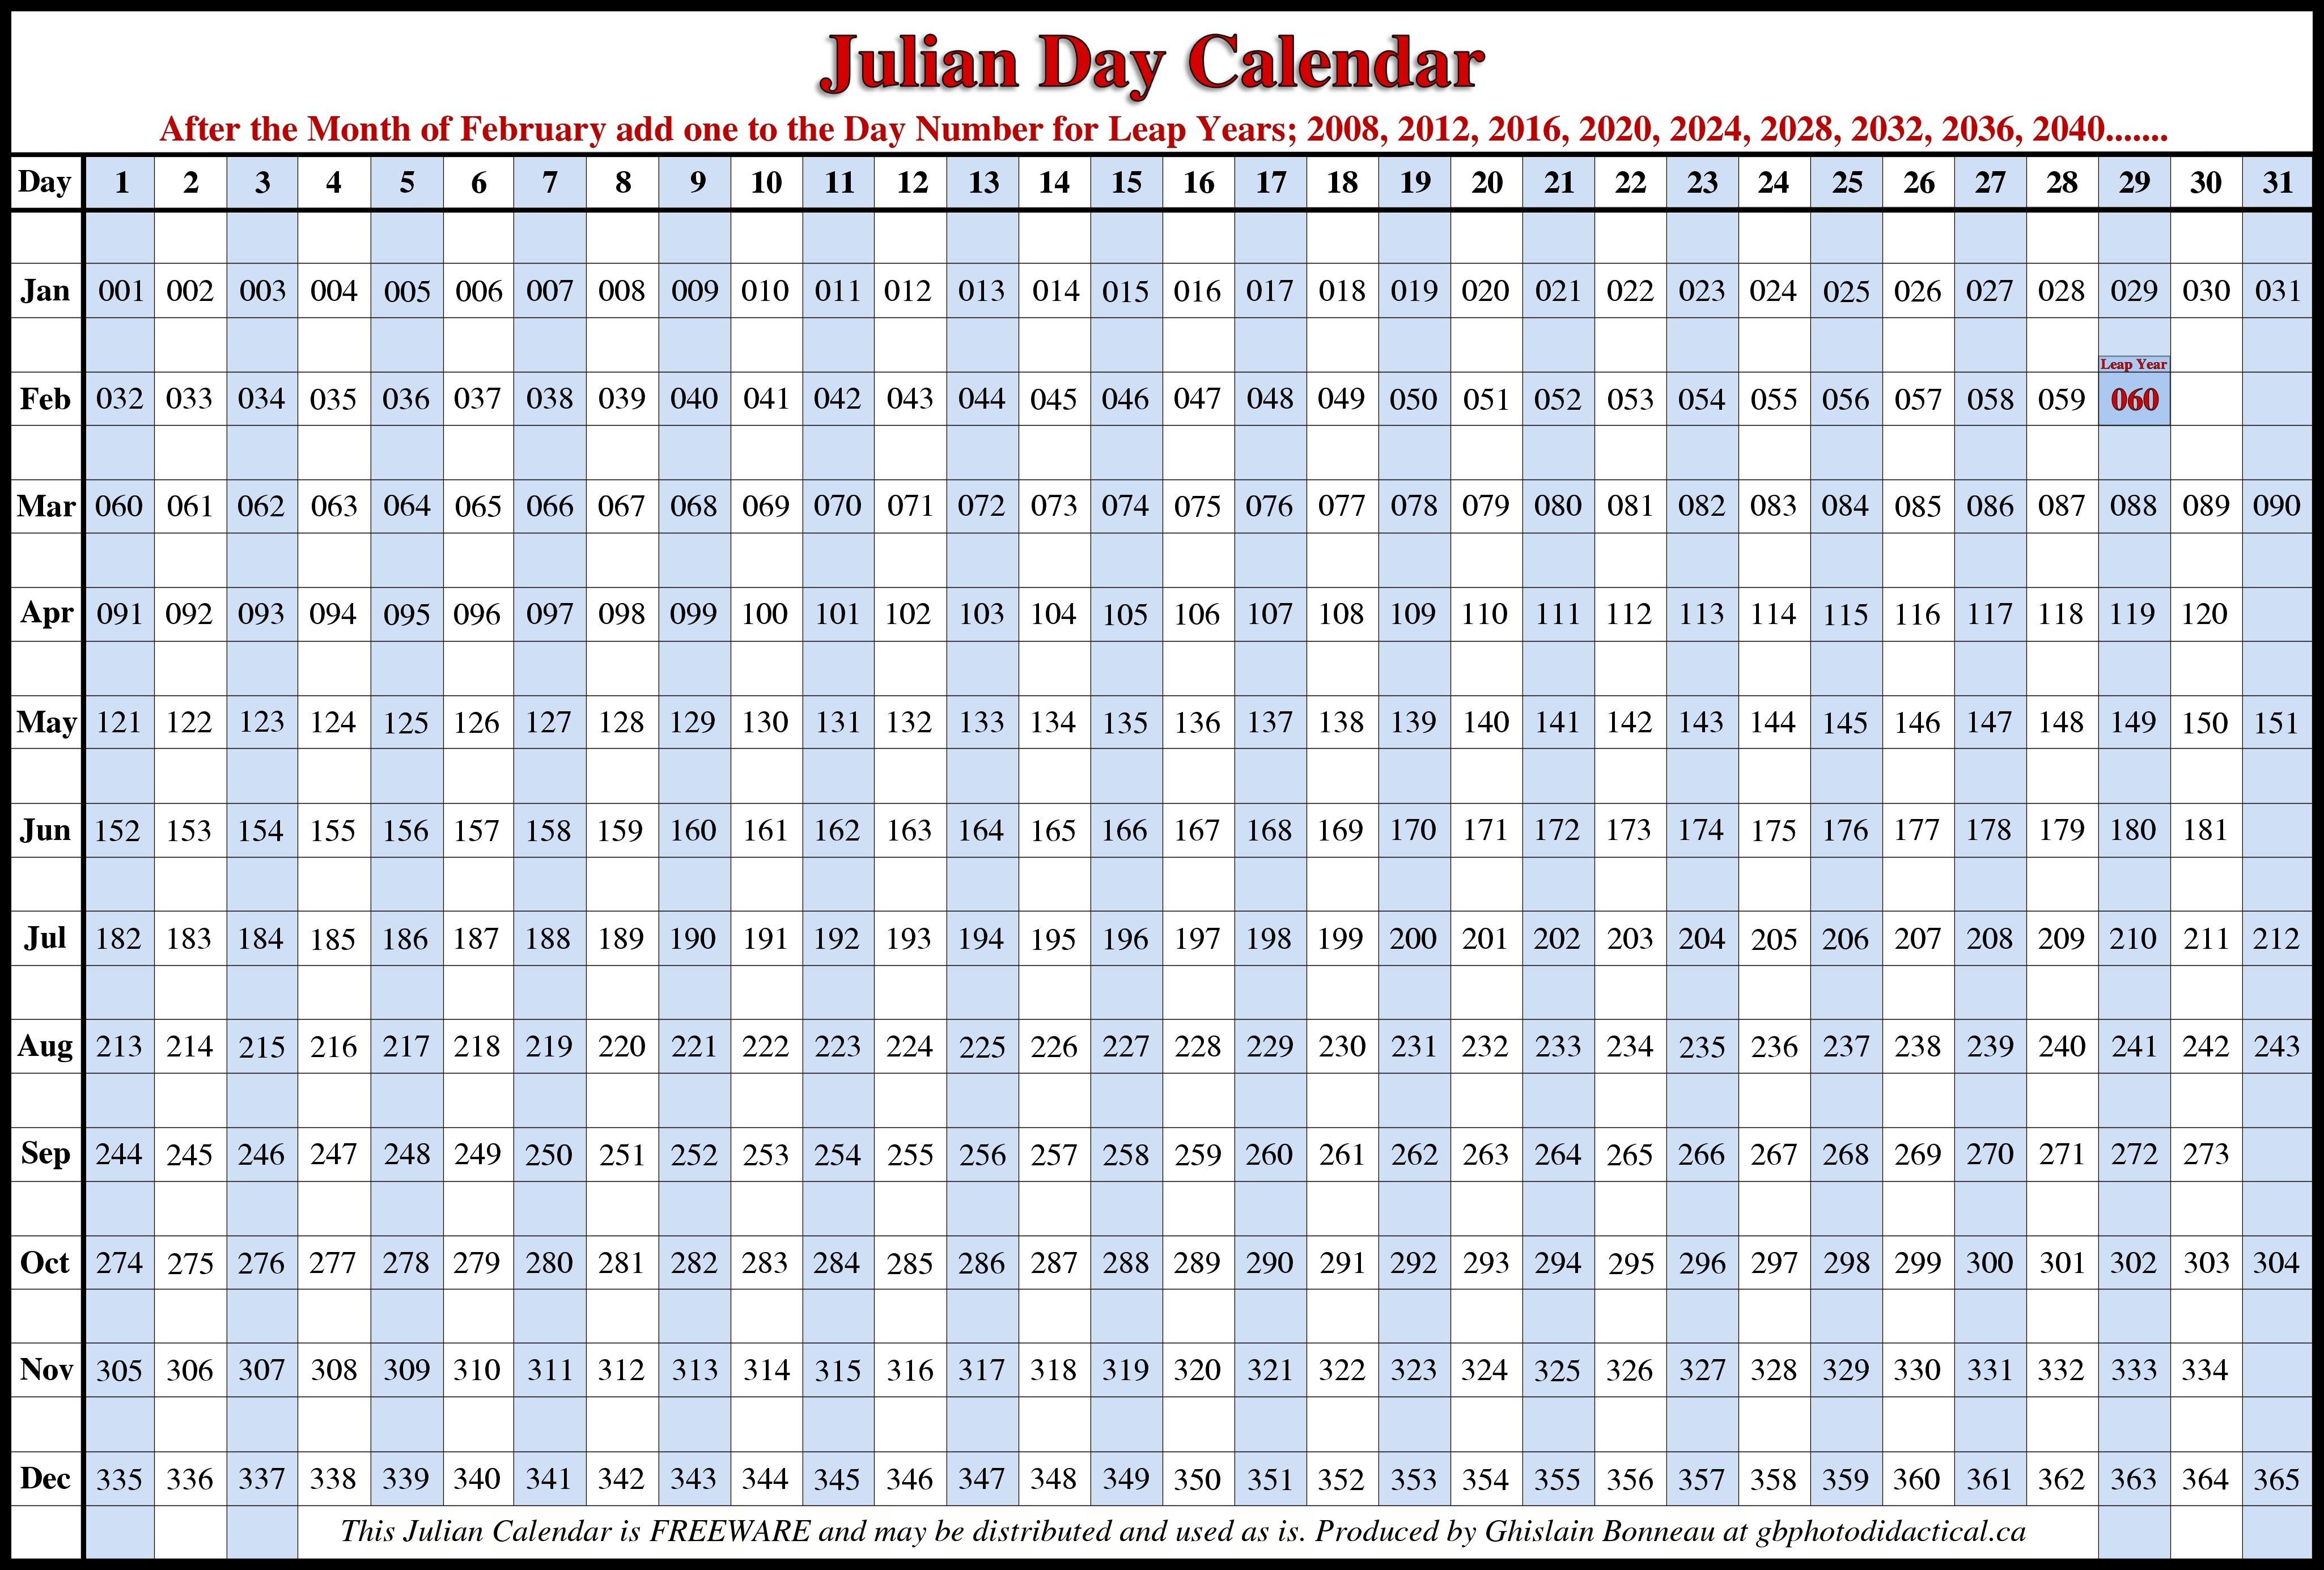 Julian Calendar 2020 Pdf Quadax | Example Calendar Printable inside Julian Calendar Pdf